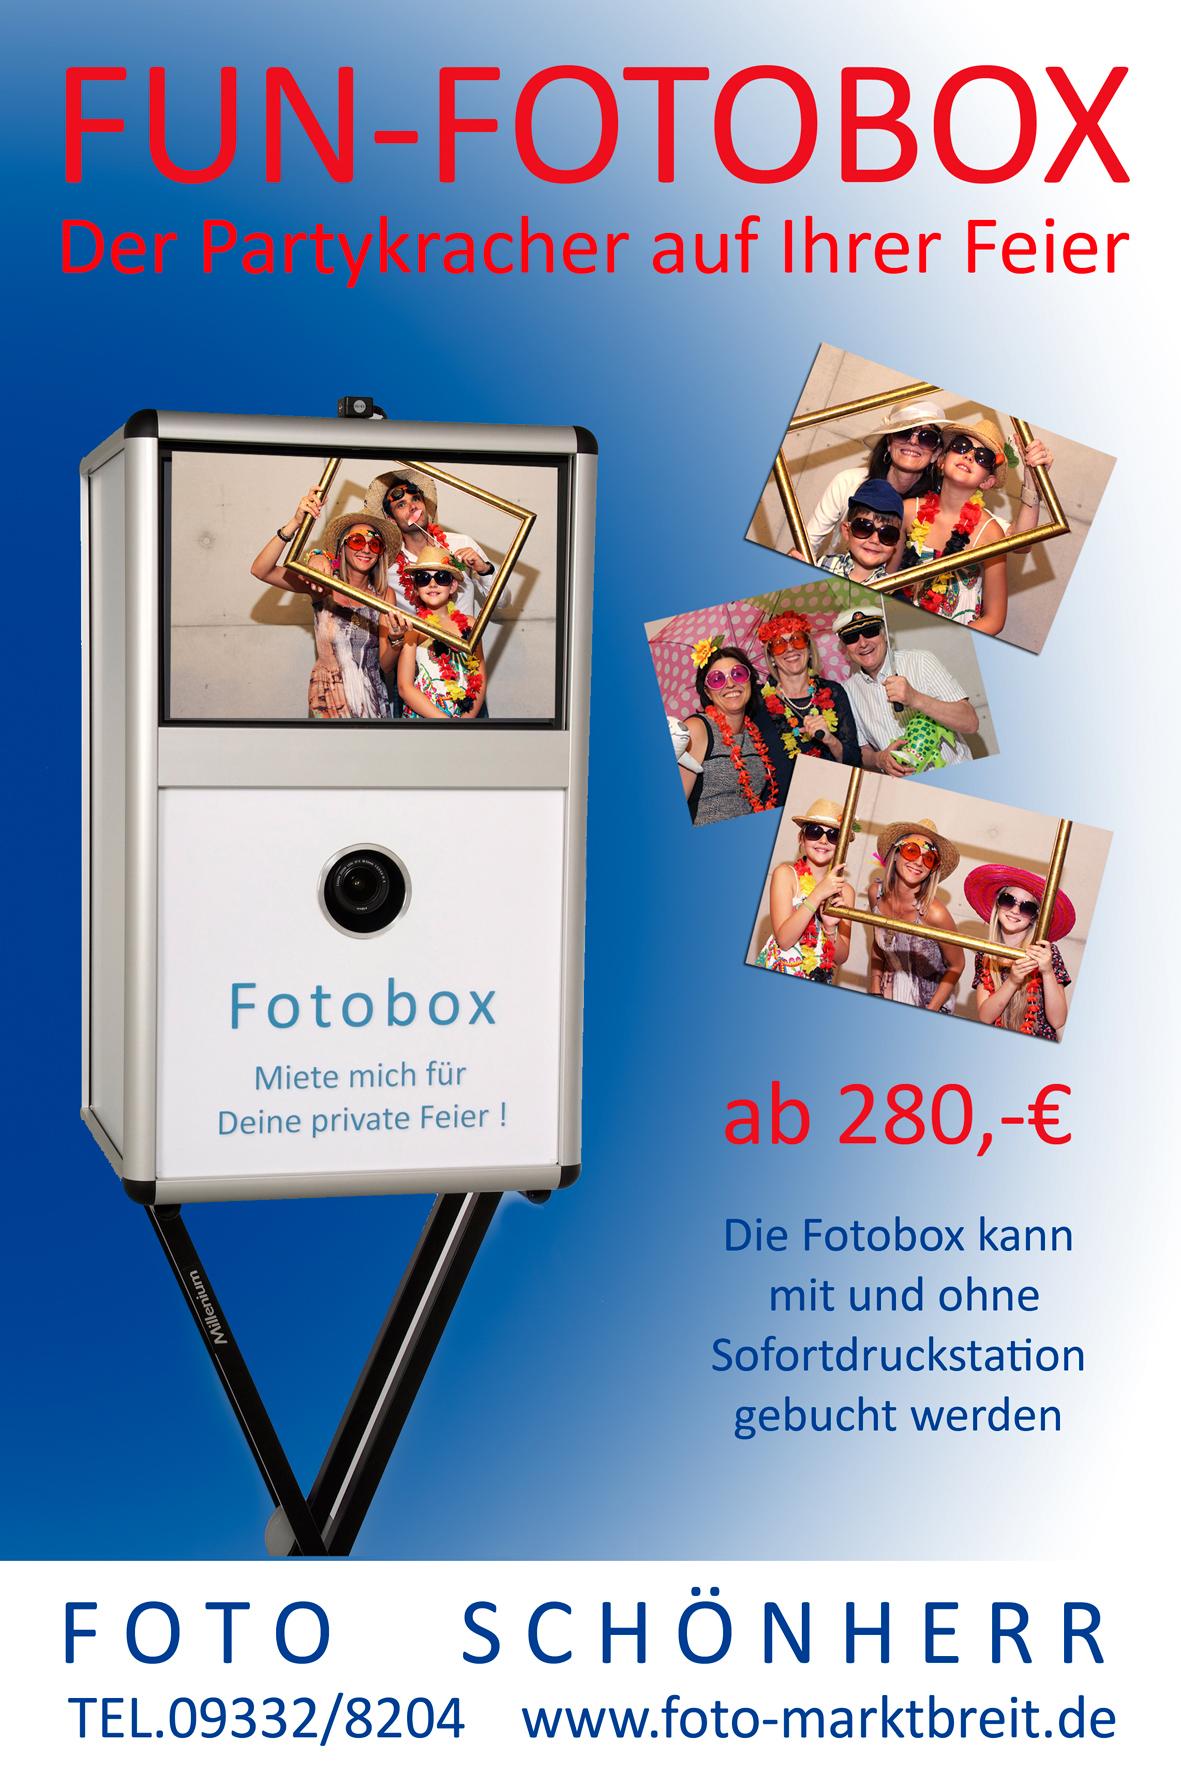 Fun-Fotobox